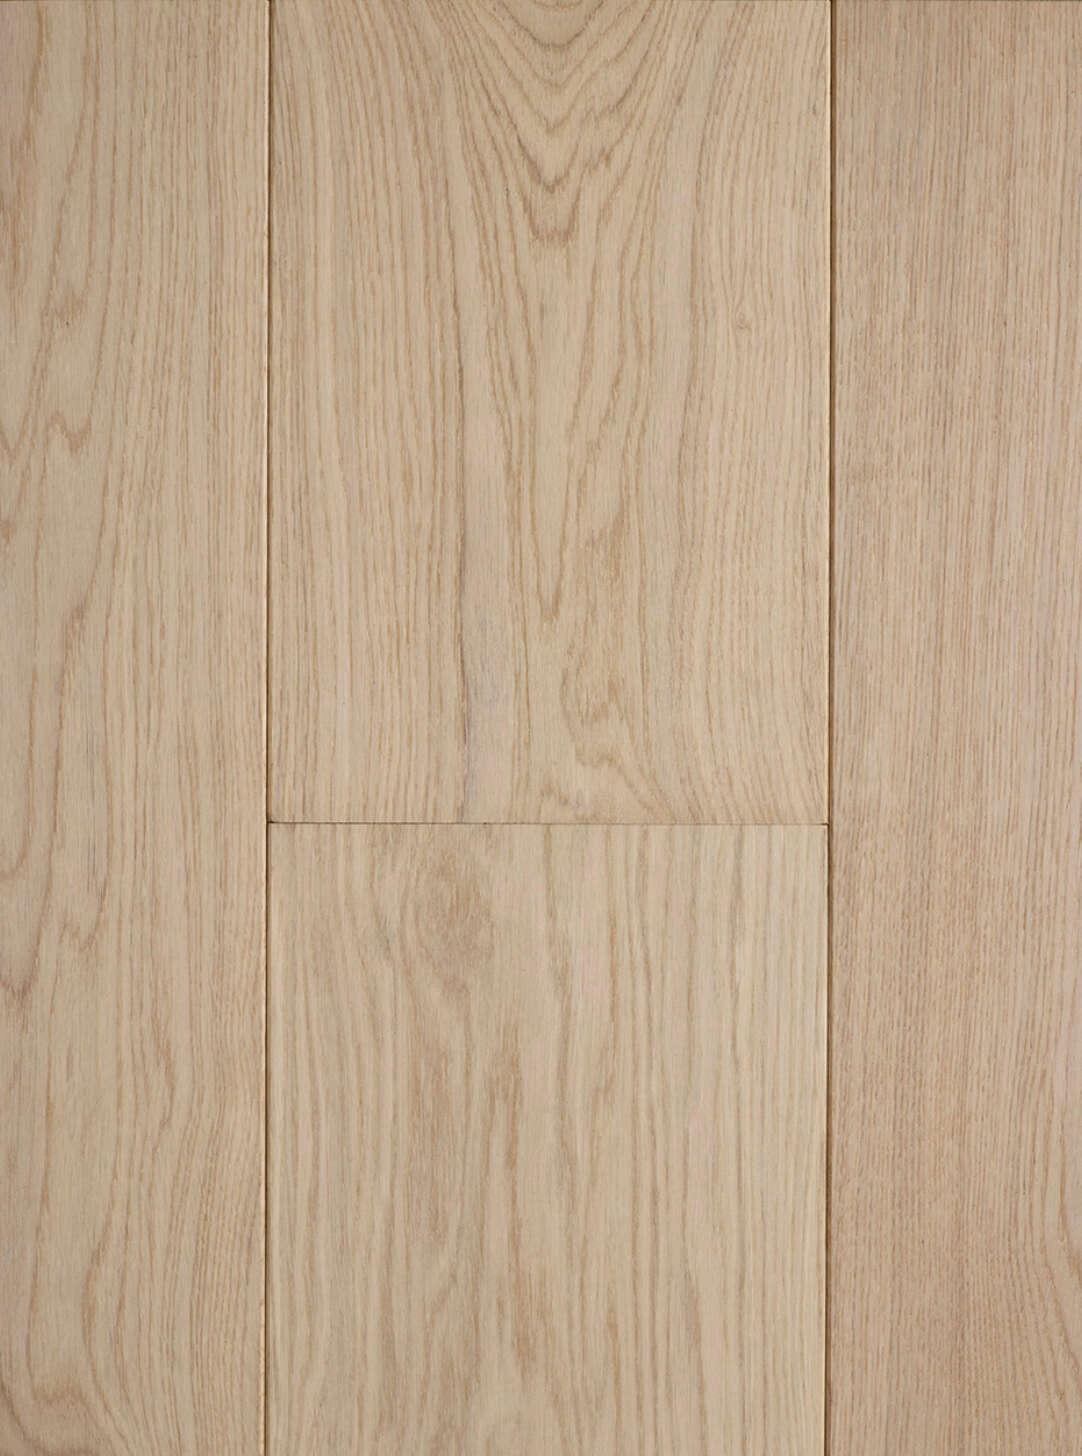 Oak polar white plank